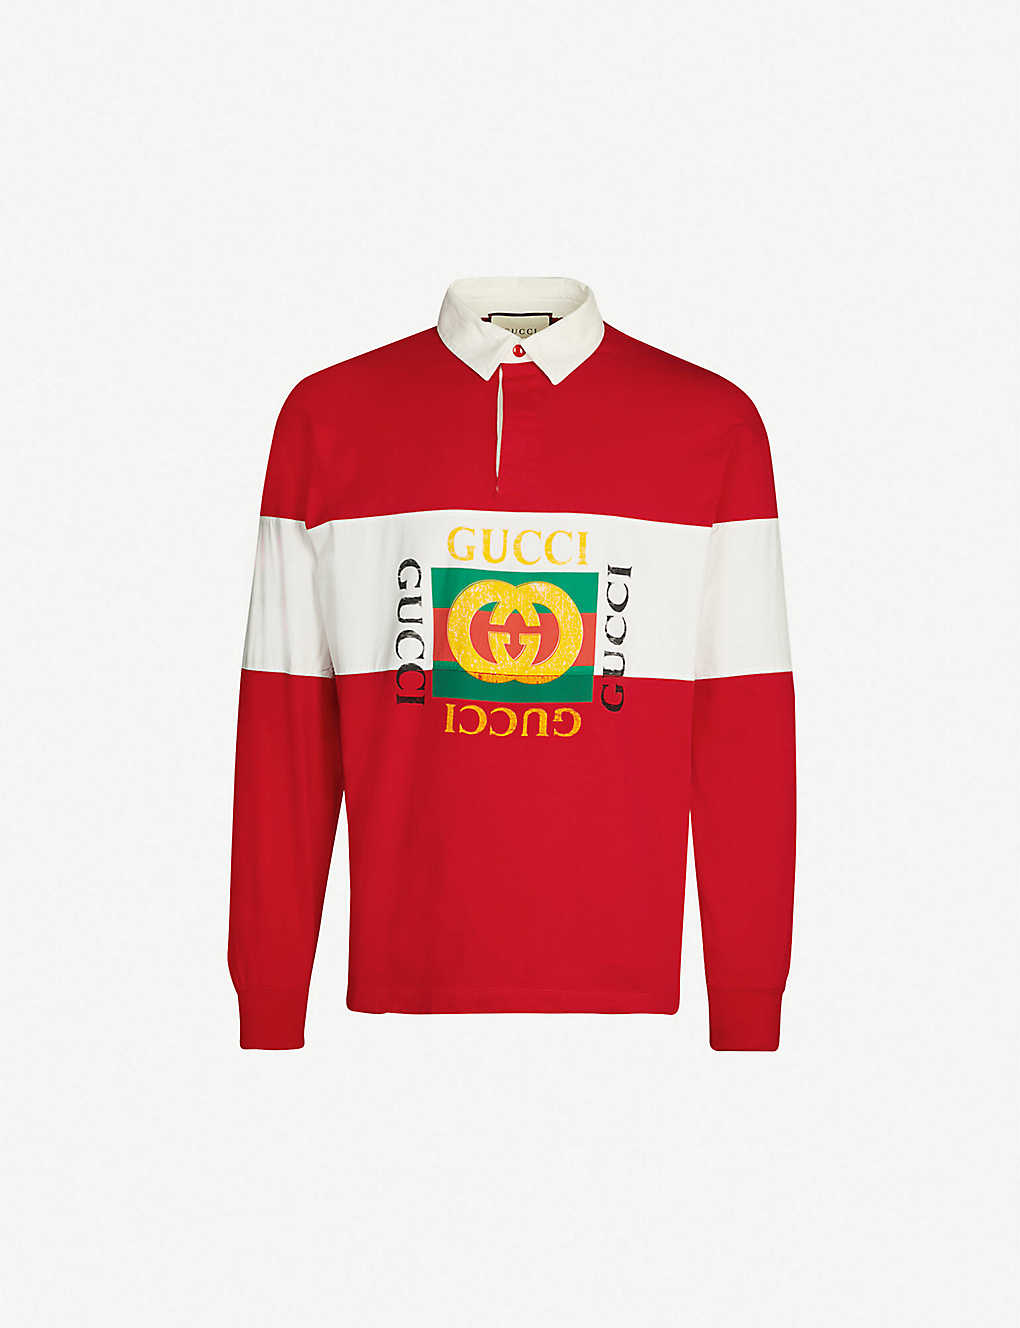 6c5dc466e29 GUCCI - Striped cotton-jersey rugby top   Selfridges.com